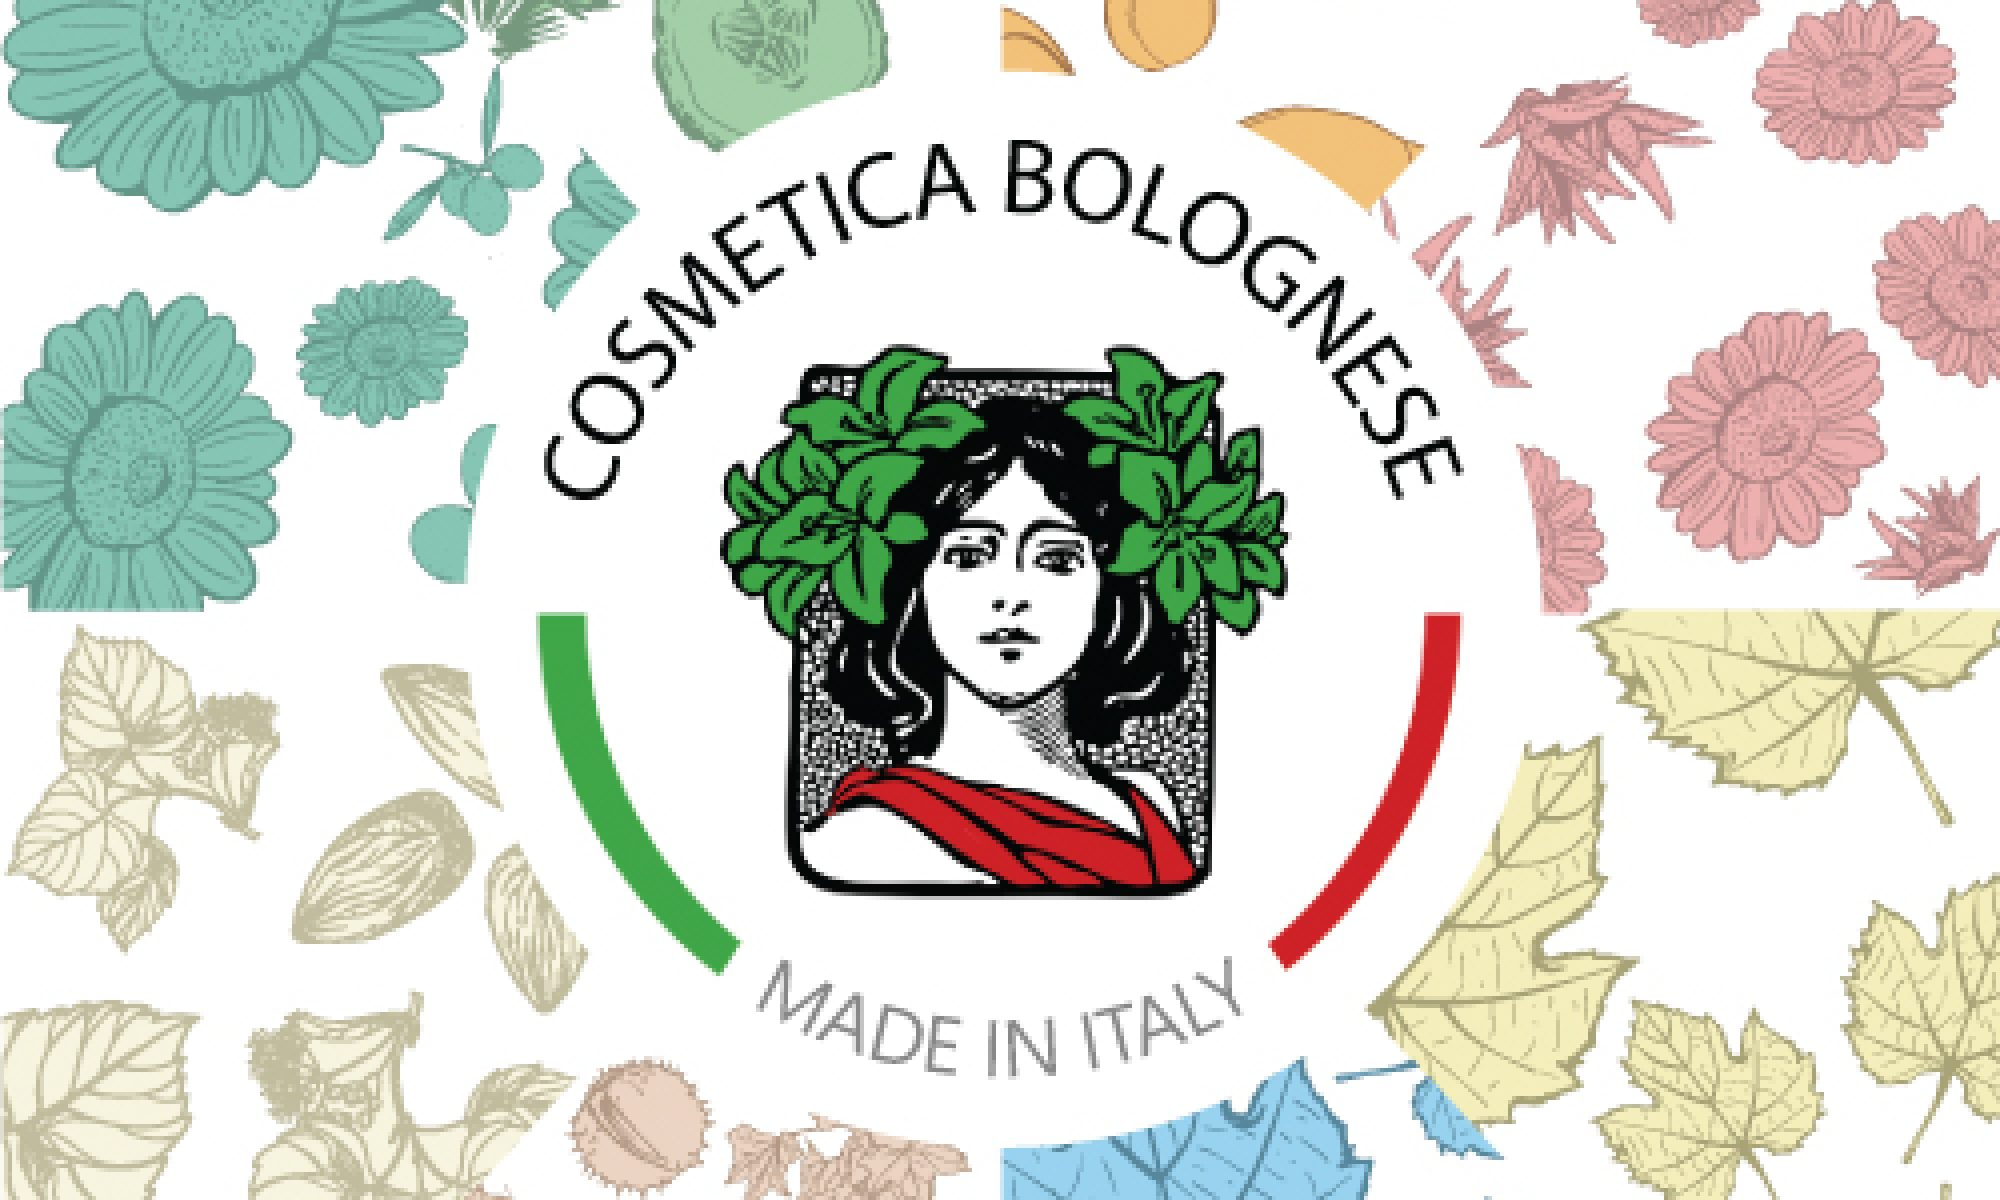 Cosmetica Bolognese